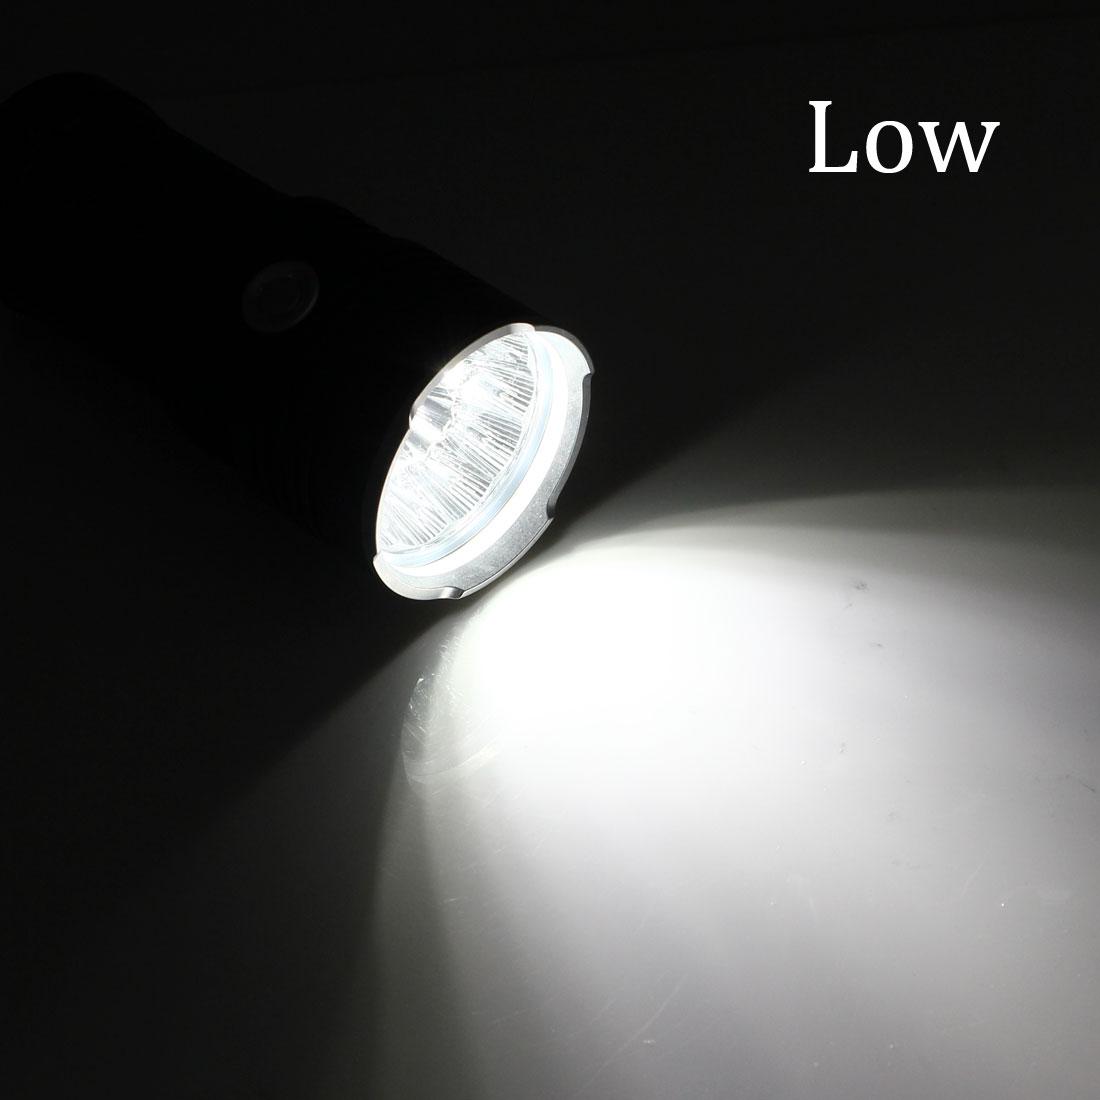 SKYRAY 12x XML-T6 LED Super Bright Backpacking Hunting Fishing Flashlight Torch Flash Lamp